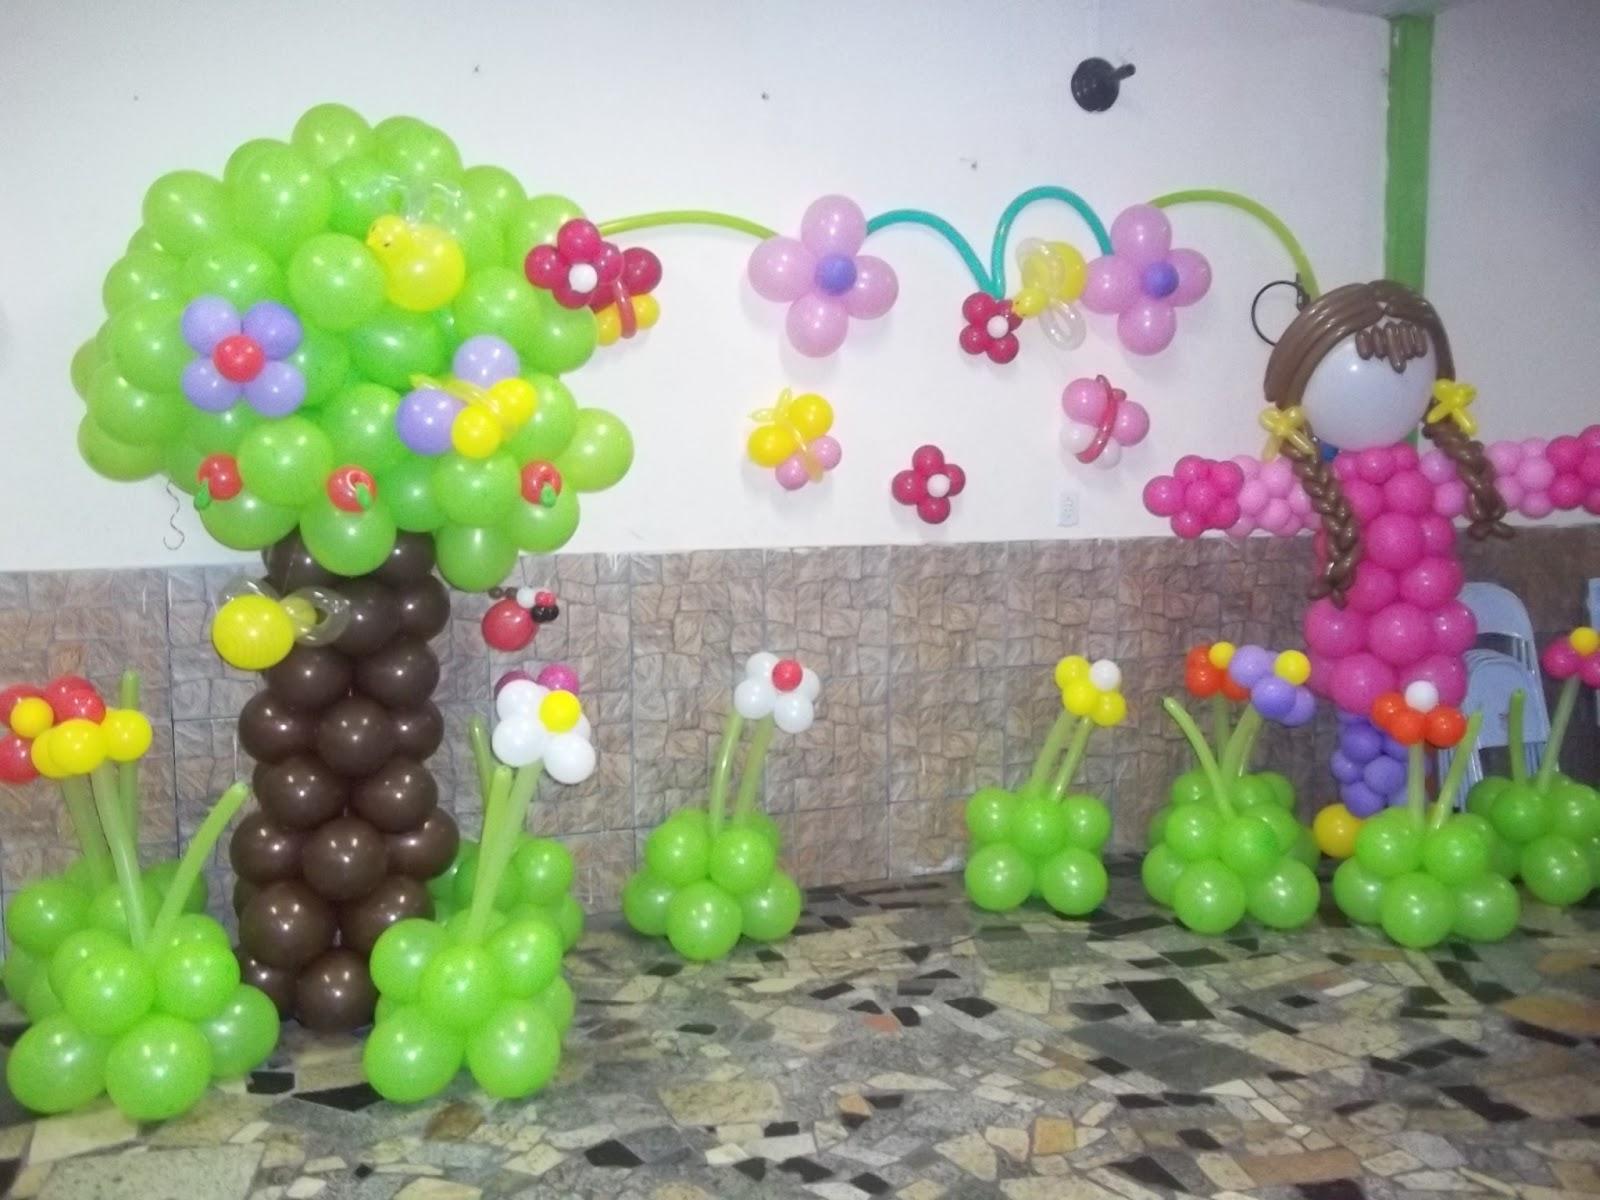 "decoracao de balões jardim encantado:Paraíso dos Balões ""Decoração E Balões"": Jardim encantado!"